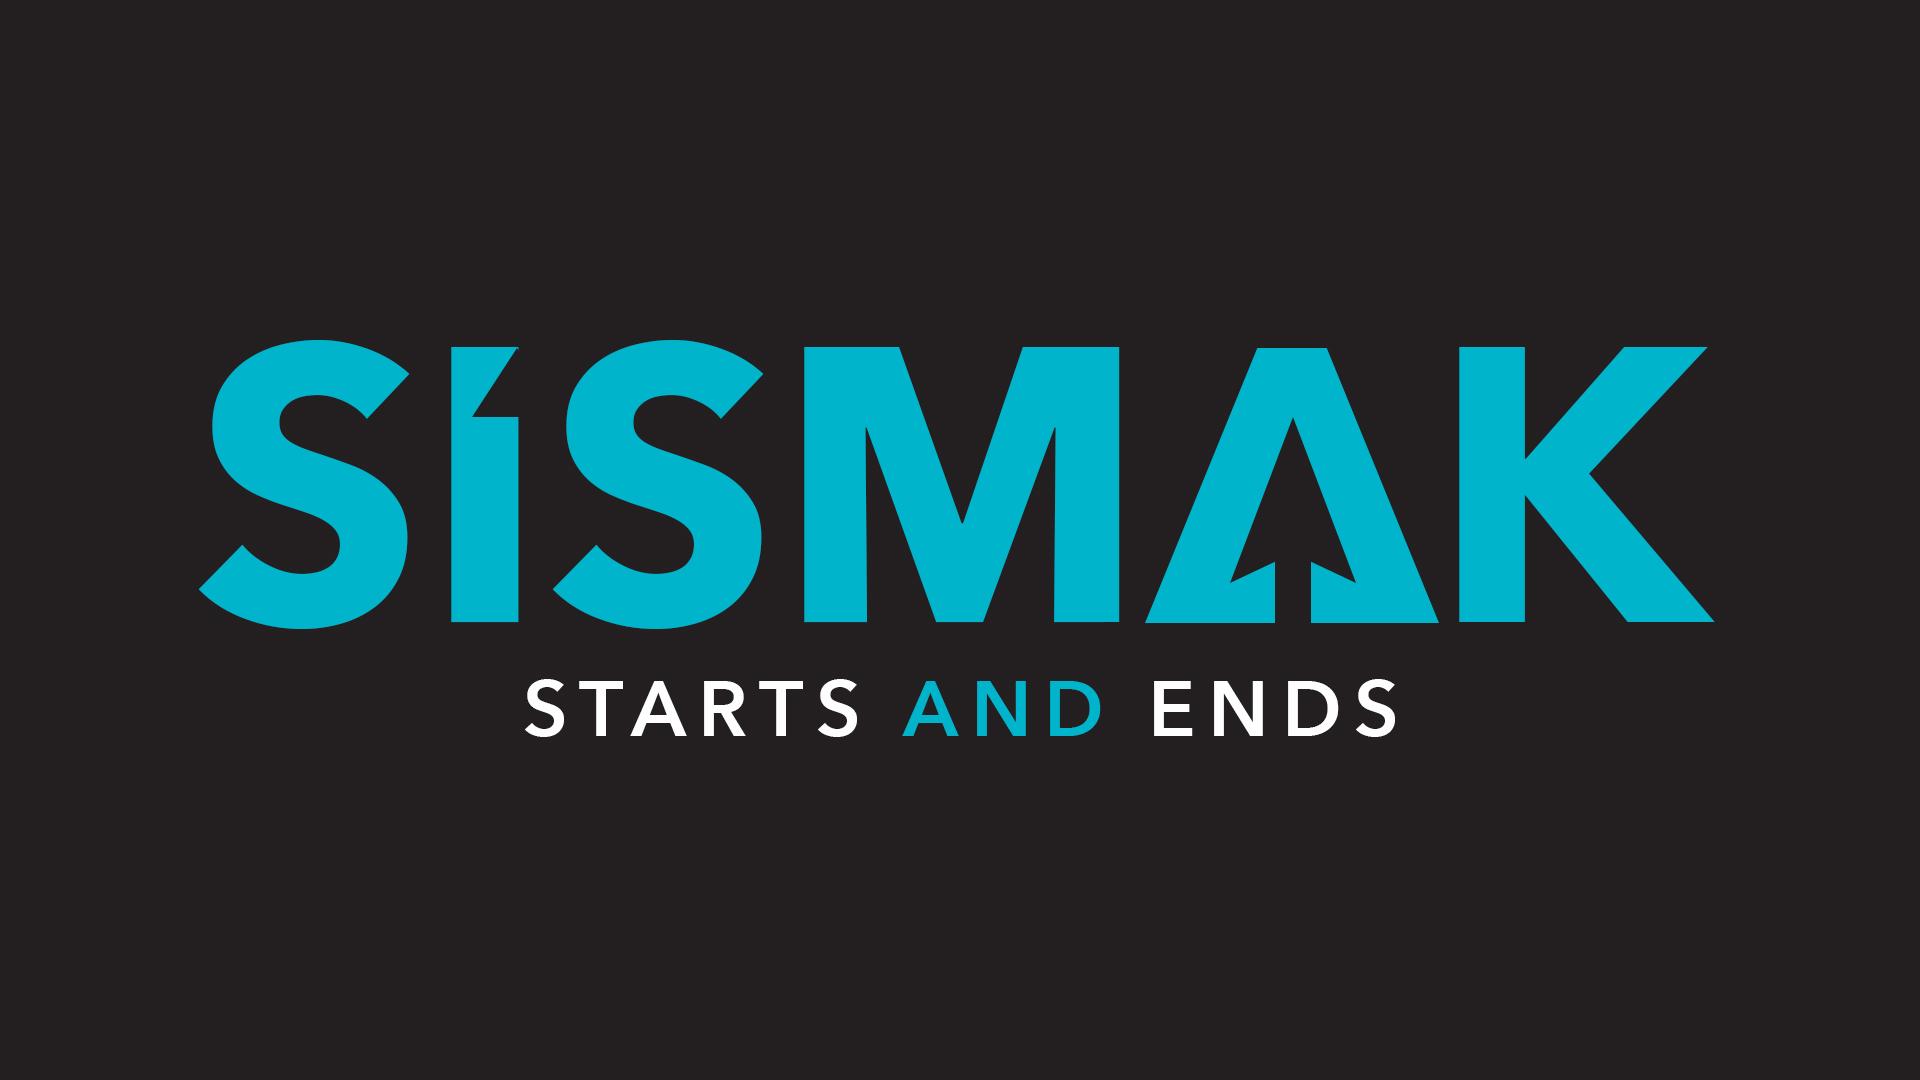 sismak-logo-starts-ends